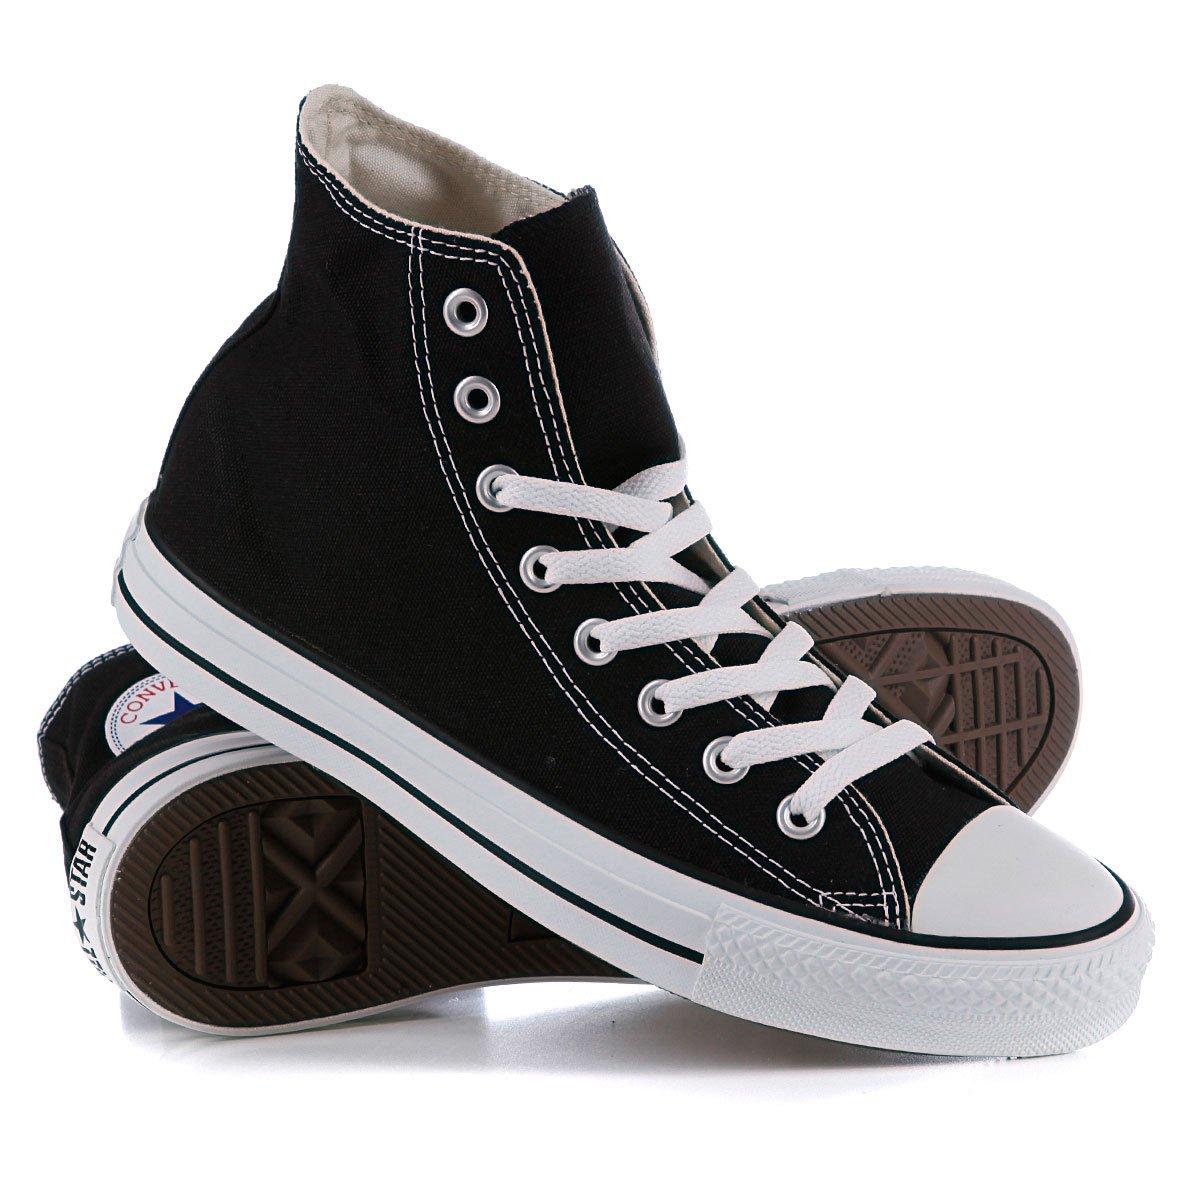 8ae5b78c Купить кеды высокие Converse All Star Hi Unisex M9160 Black ...